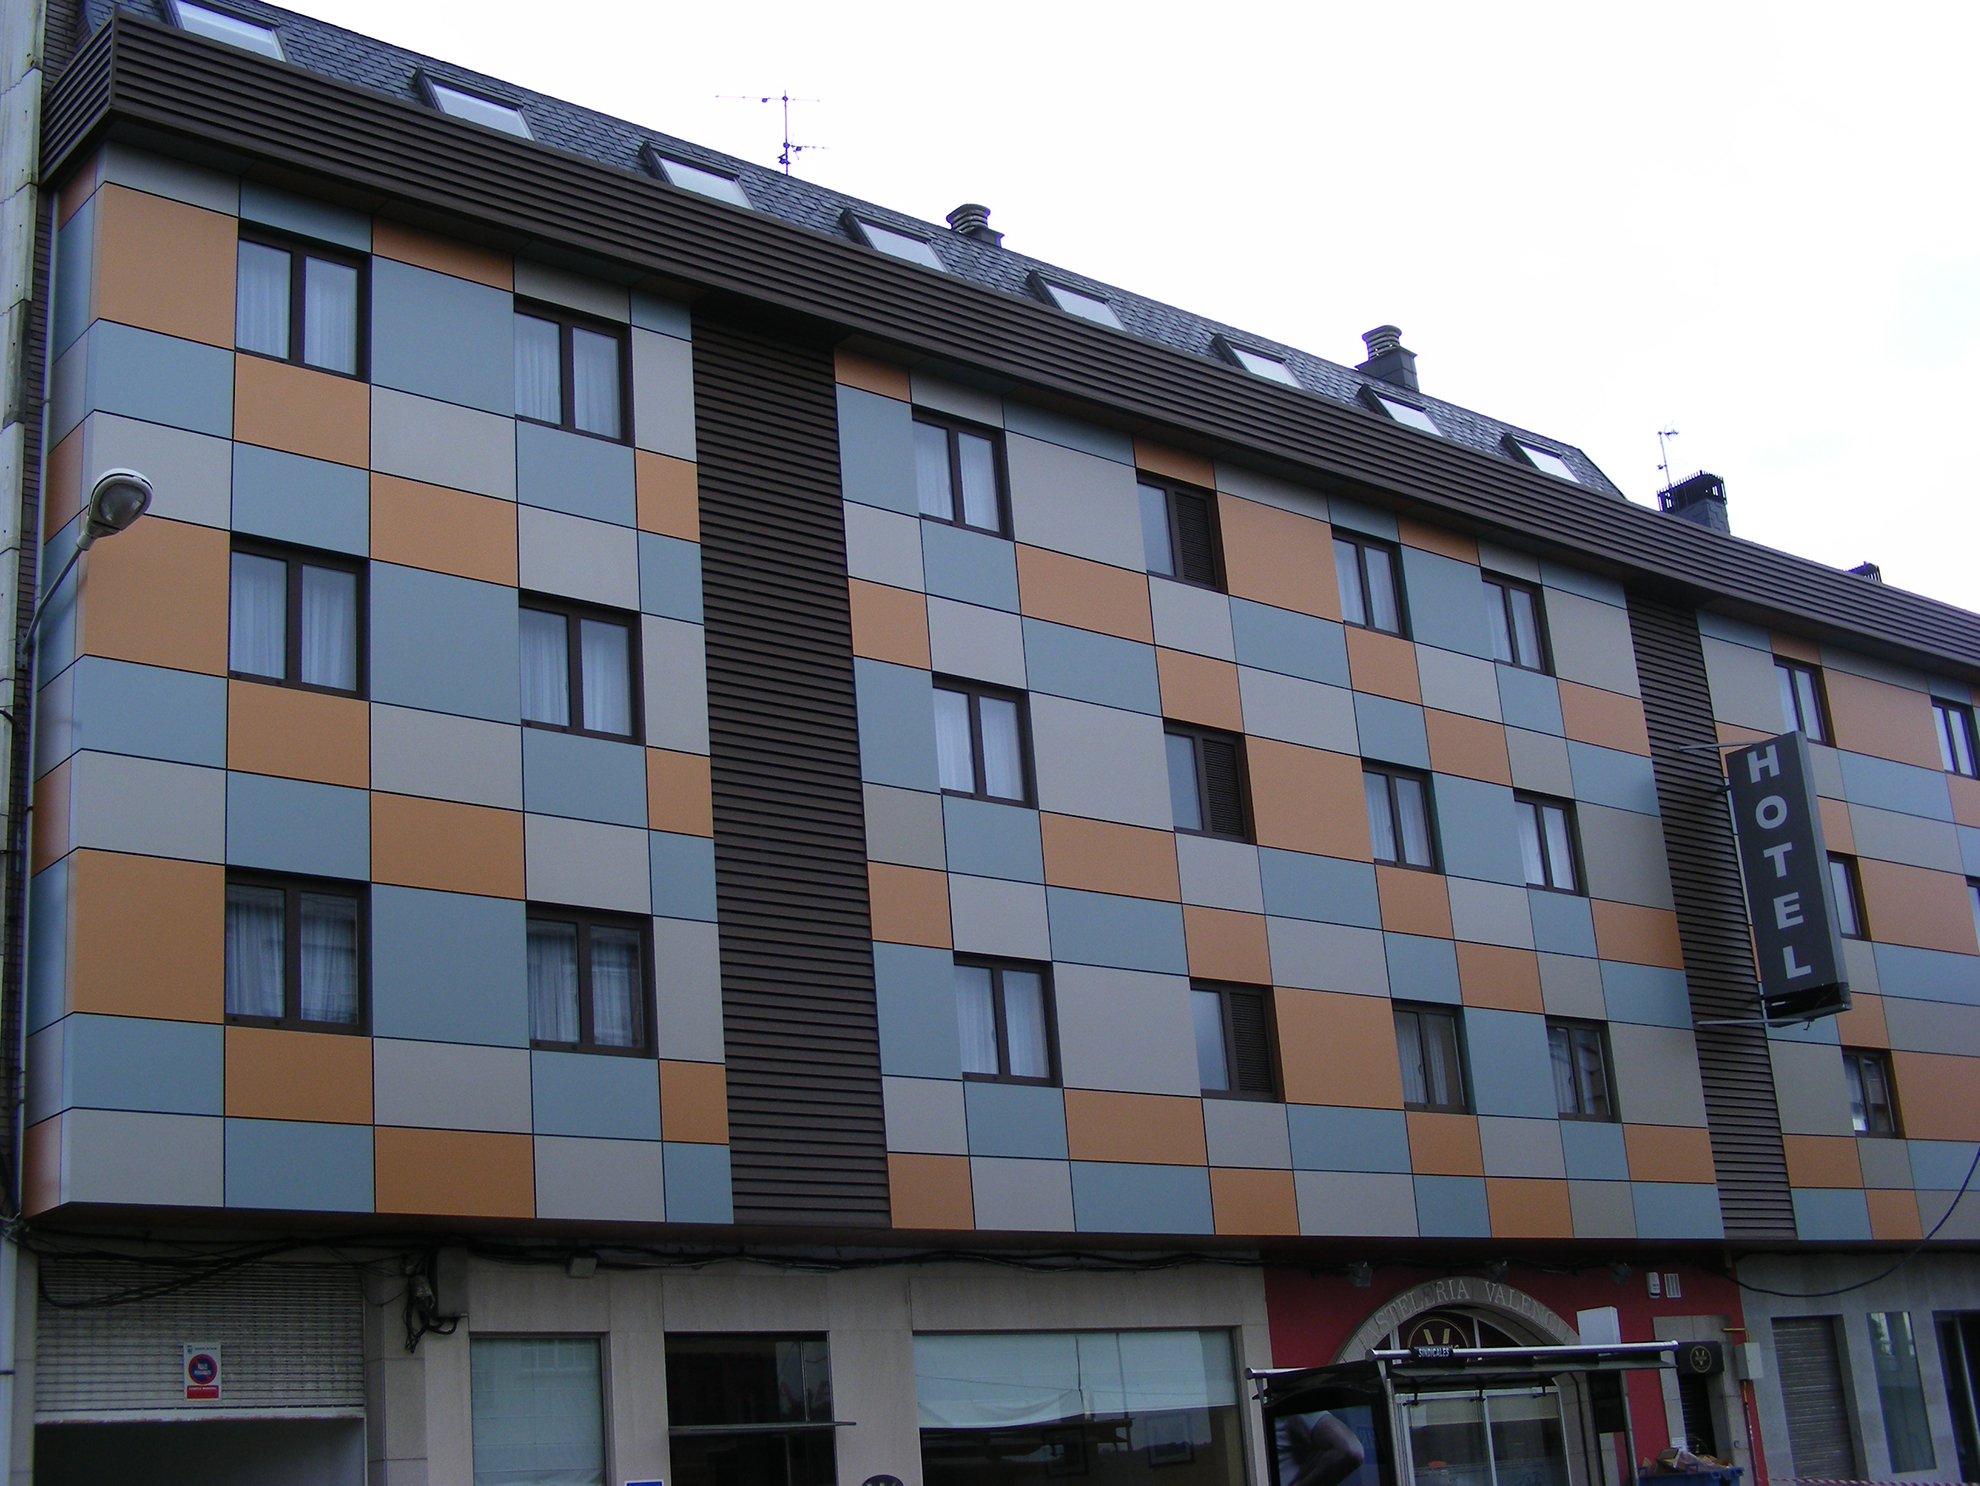 Hotel-Rio-Mio.-Crta-Catabois-Ferrol-Espaa.-larson--2_1585841195.jpg